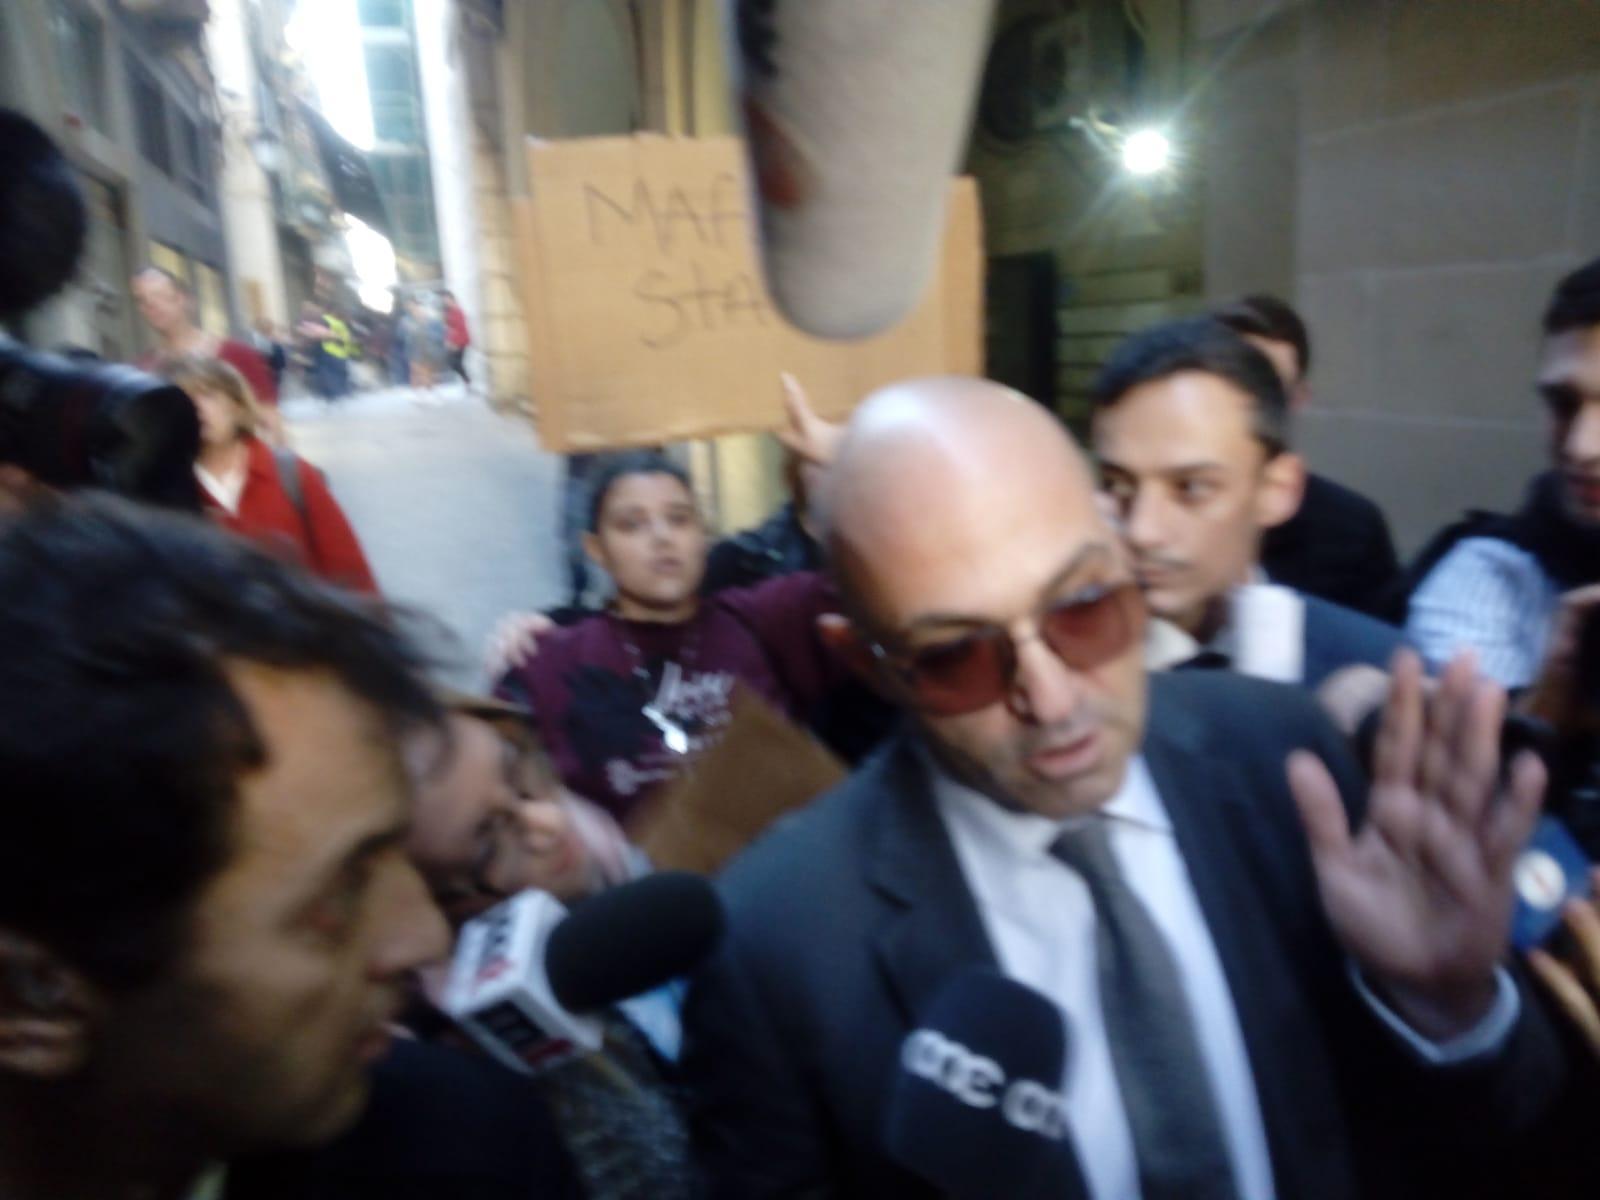 Yorgen Fenech walking unprotected down the streets of Valletta. Photo: Matthew Xuereb